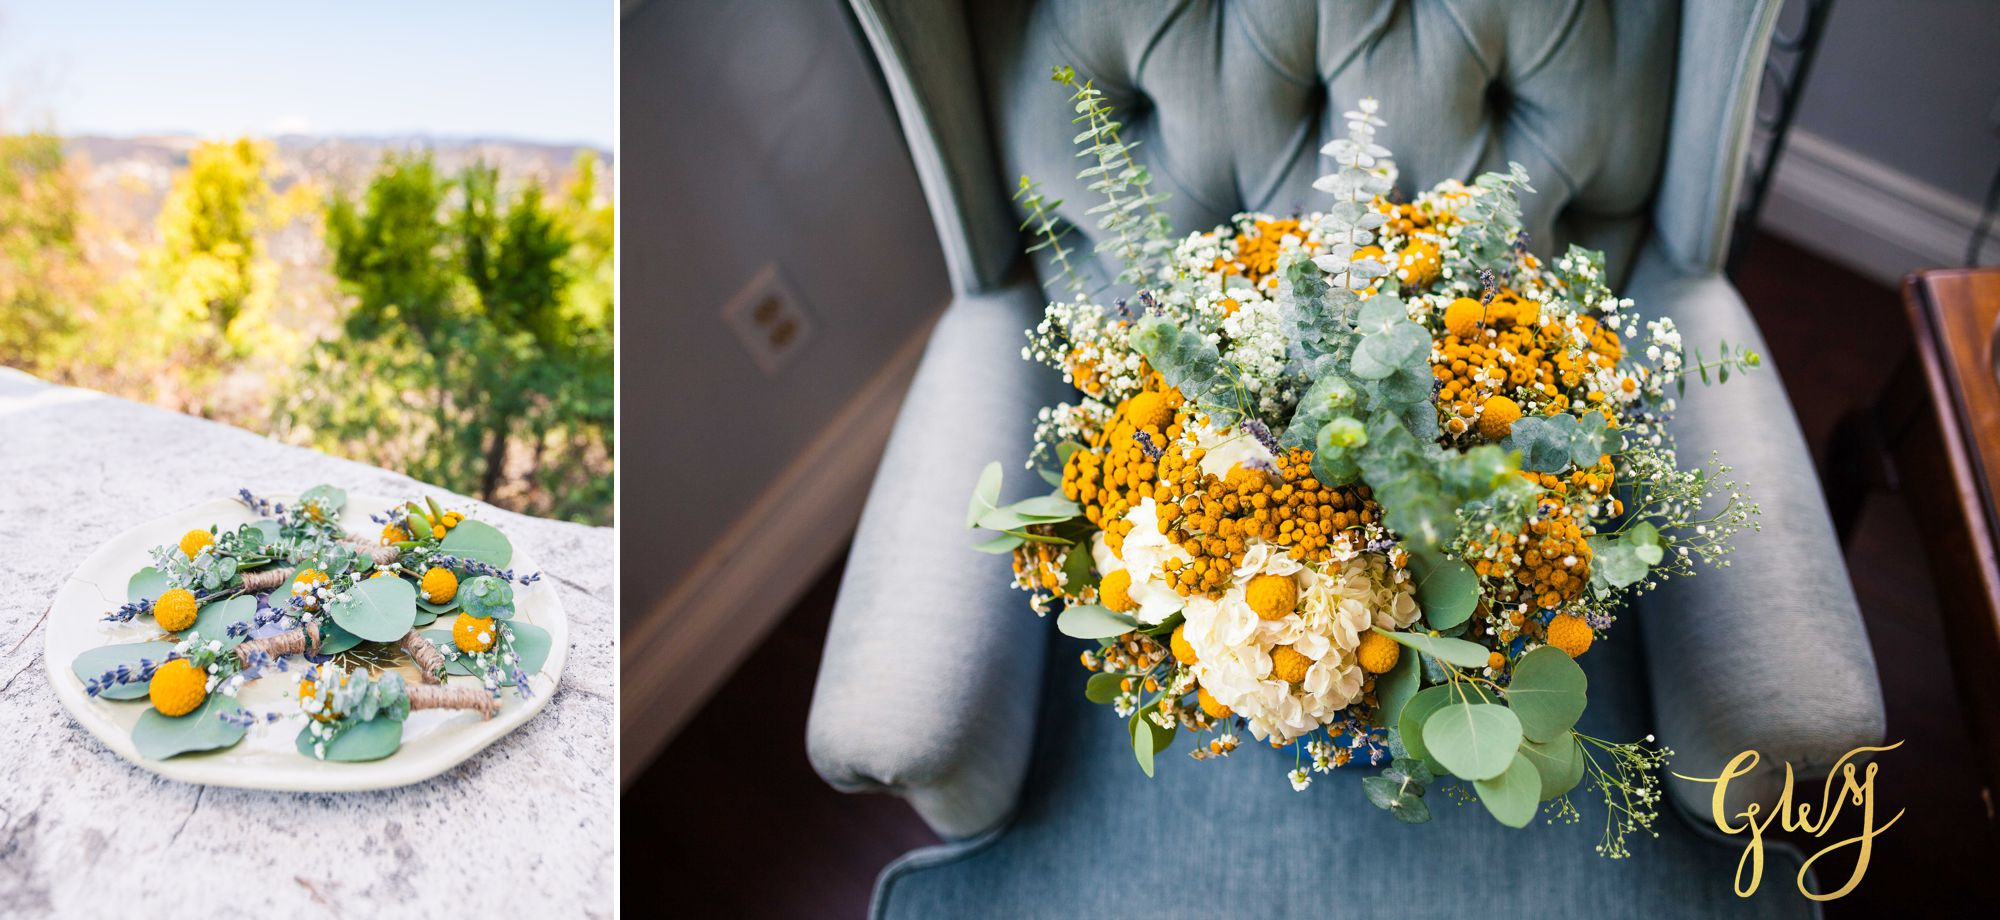 Hannah + Lorenzo Secluded Garden Estate Temecula DIY Wedding by Glass Woods Media 6.jpg